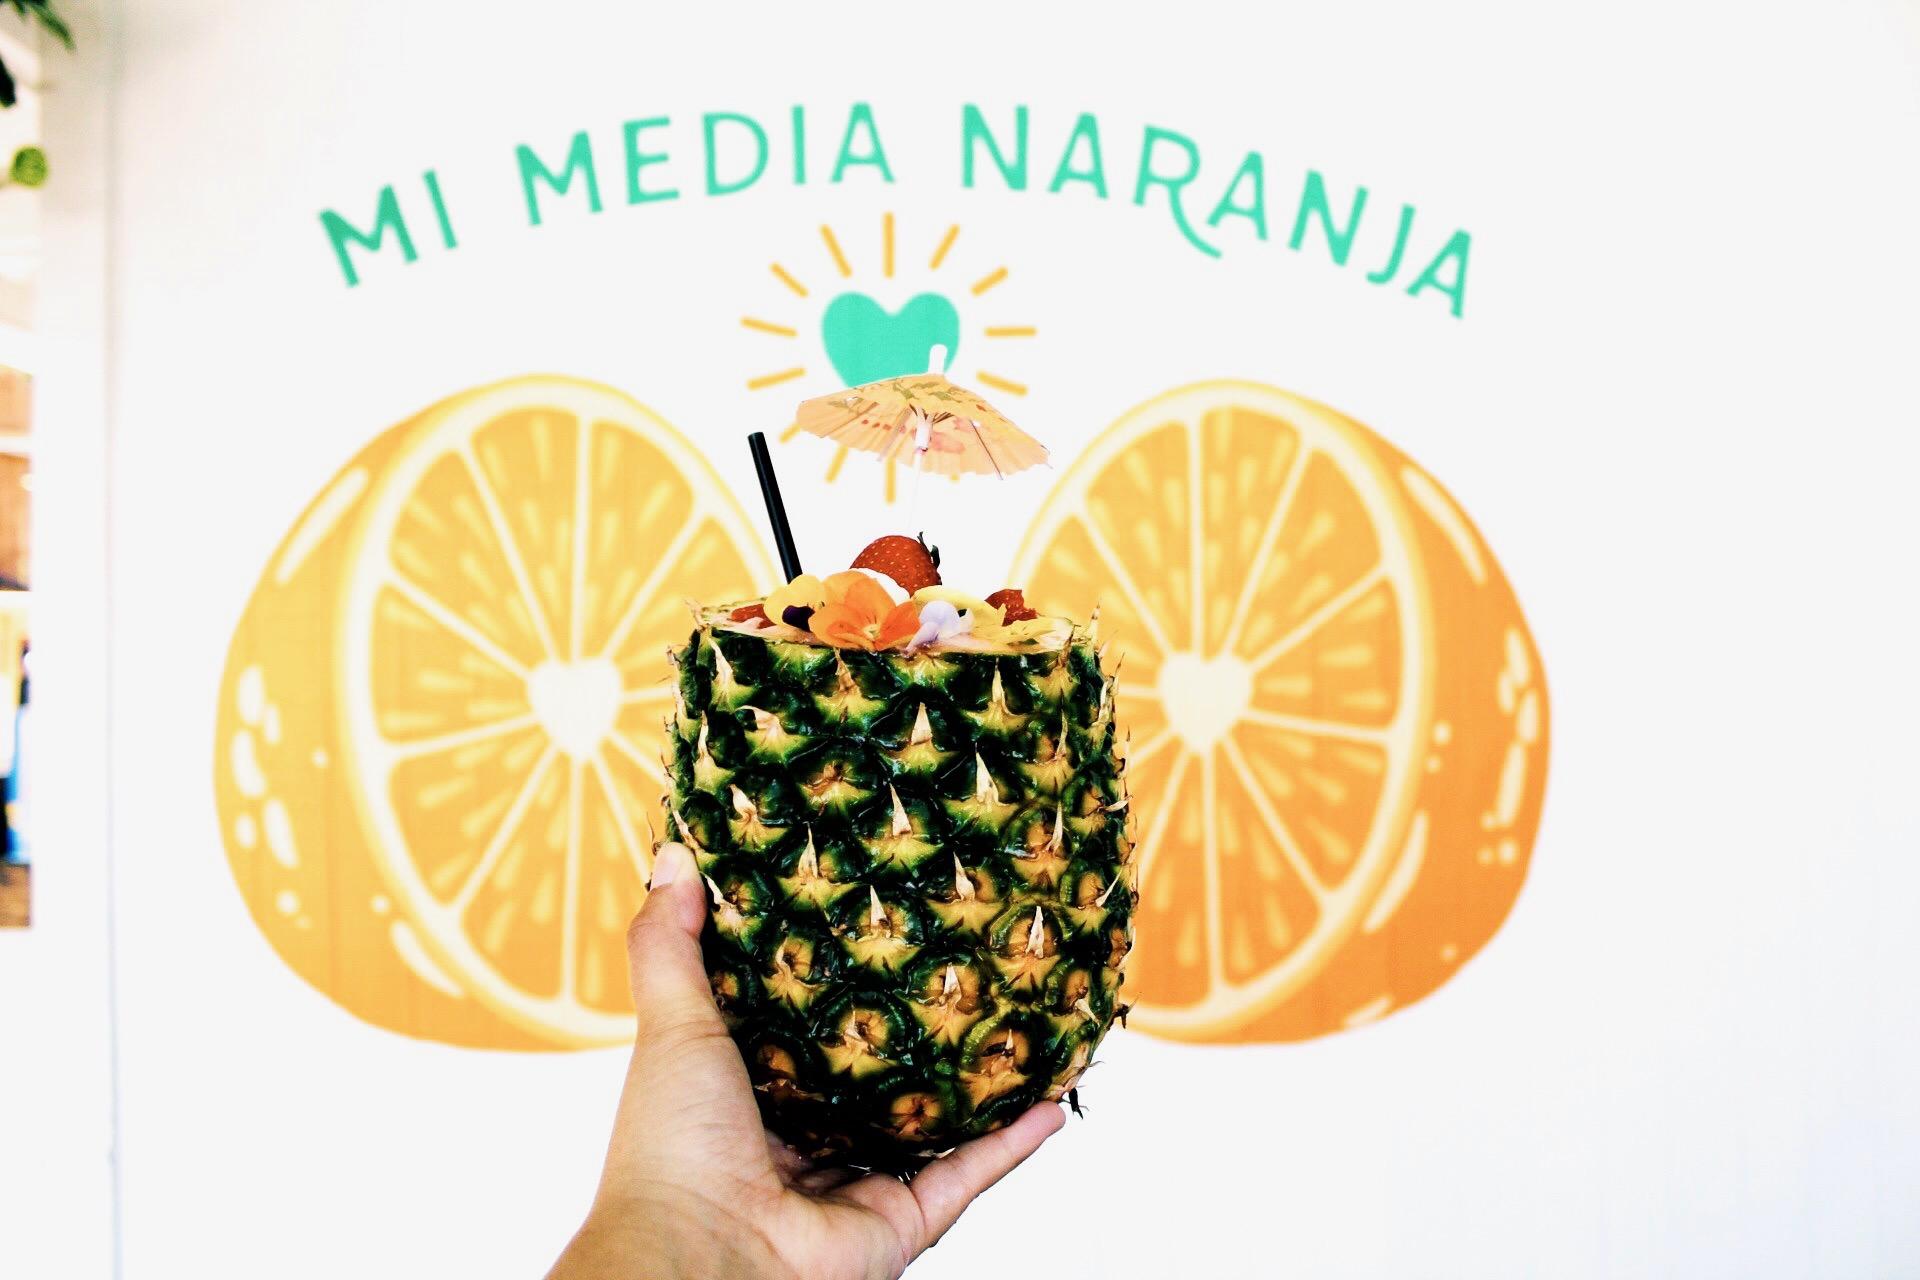 PIÑA PARA LA NIÑA    Strawberry frozen margarita served in a pineapple